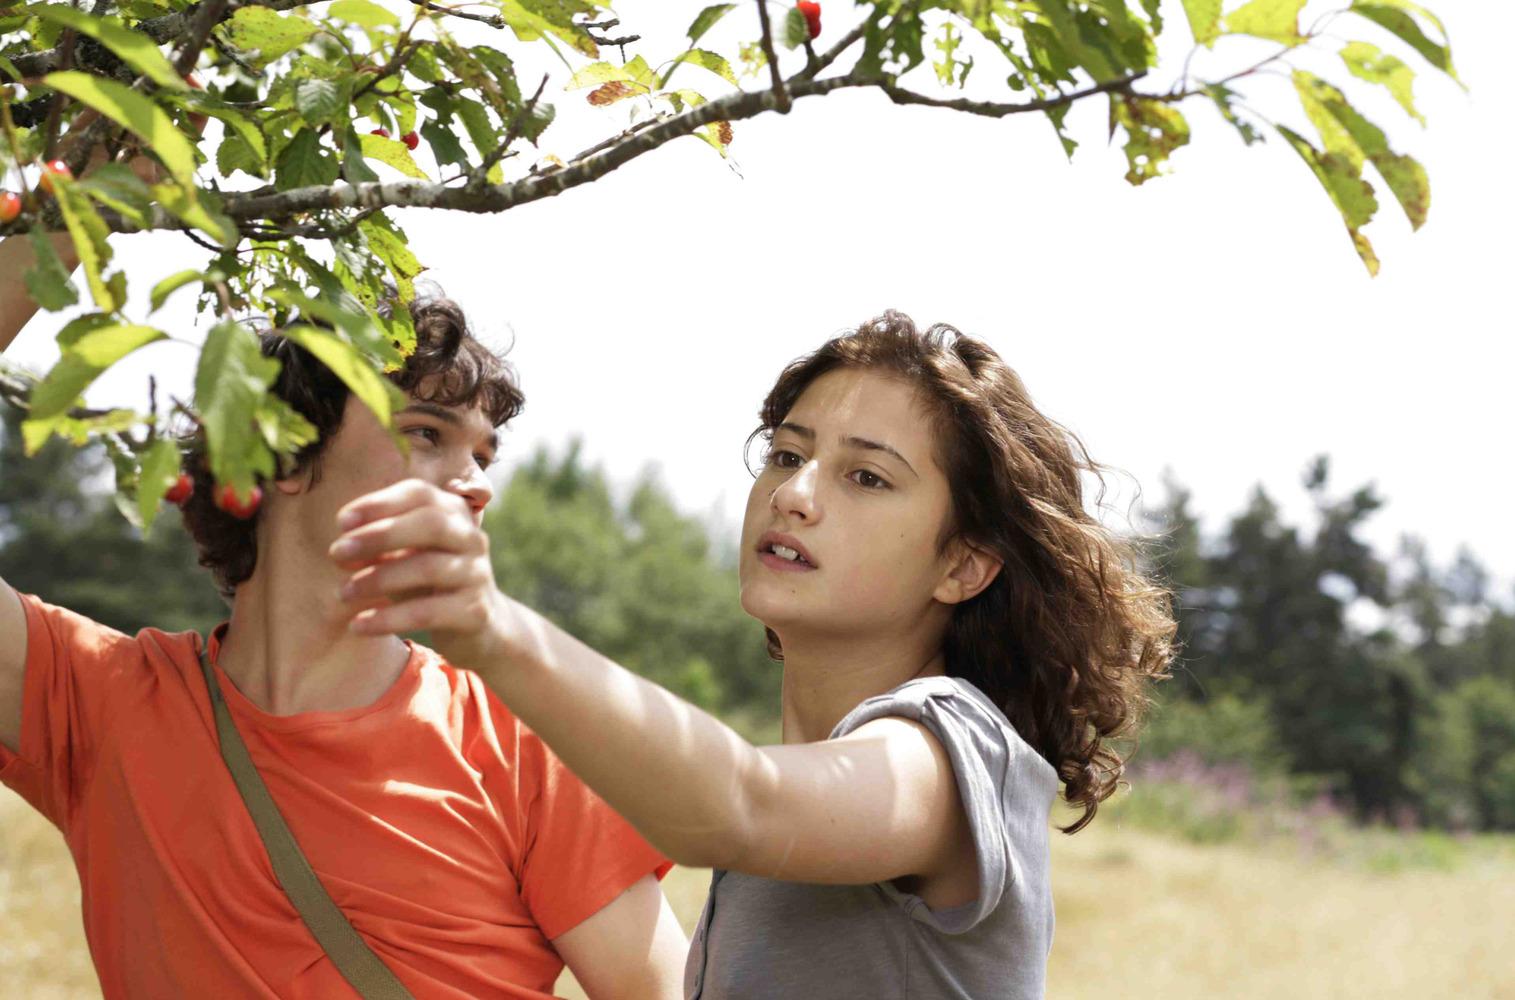 un-amour-de-jeunesse-un-amour-de-jeunesse-06-07-2011-1-g